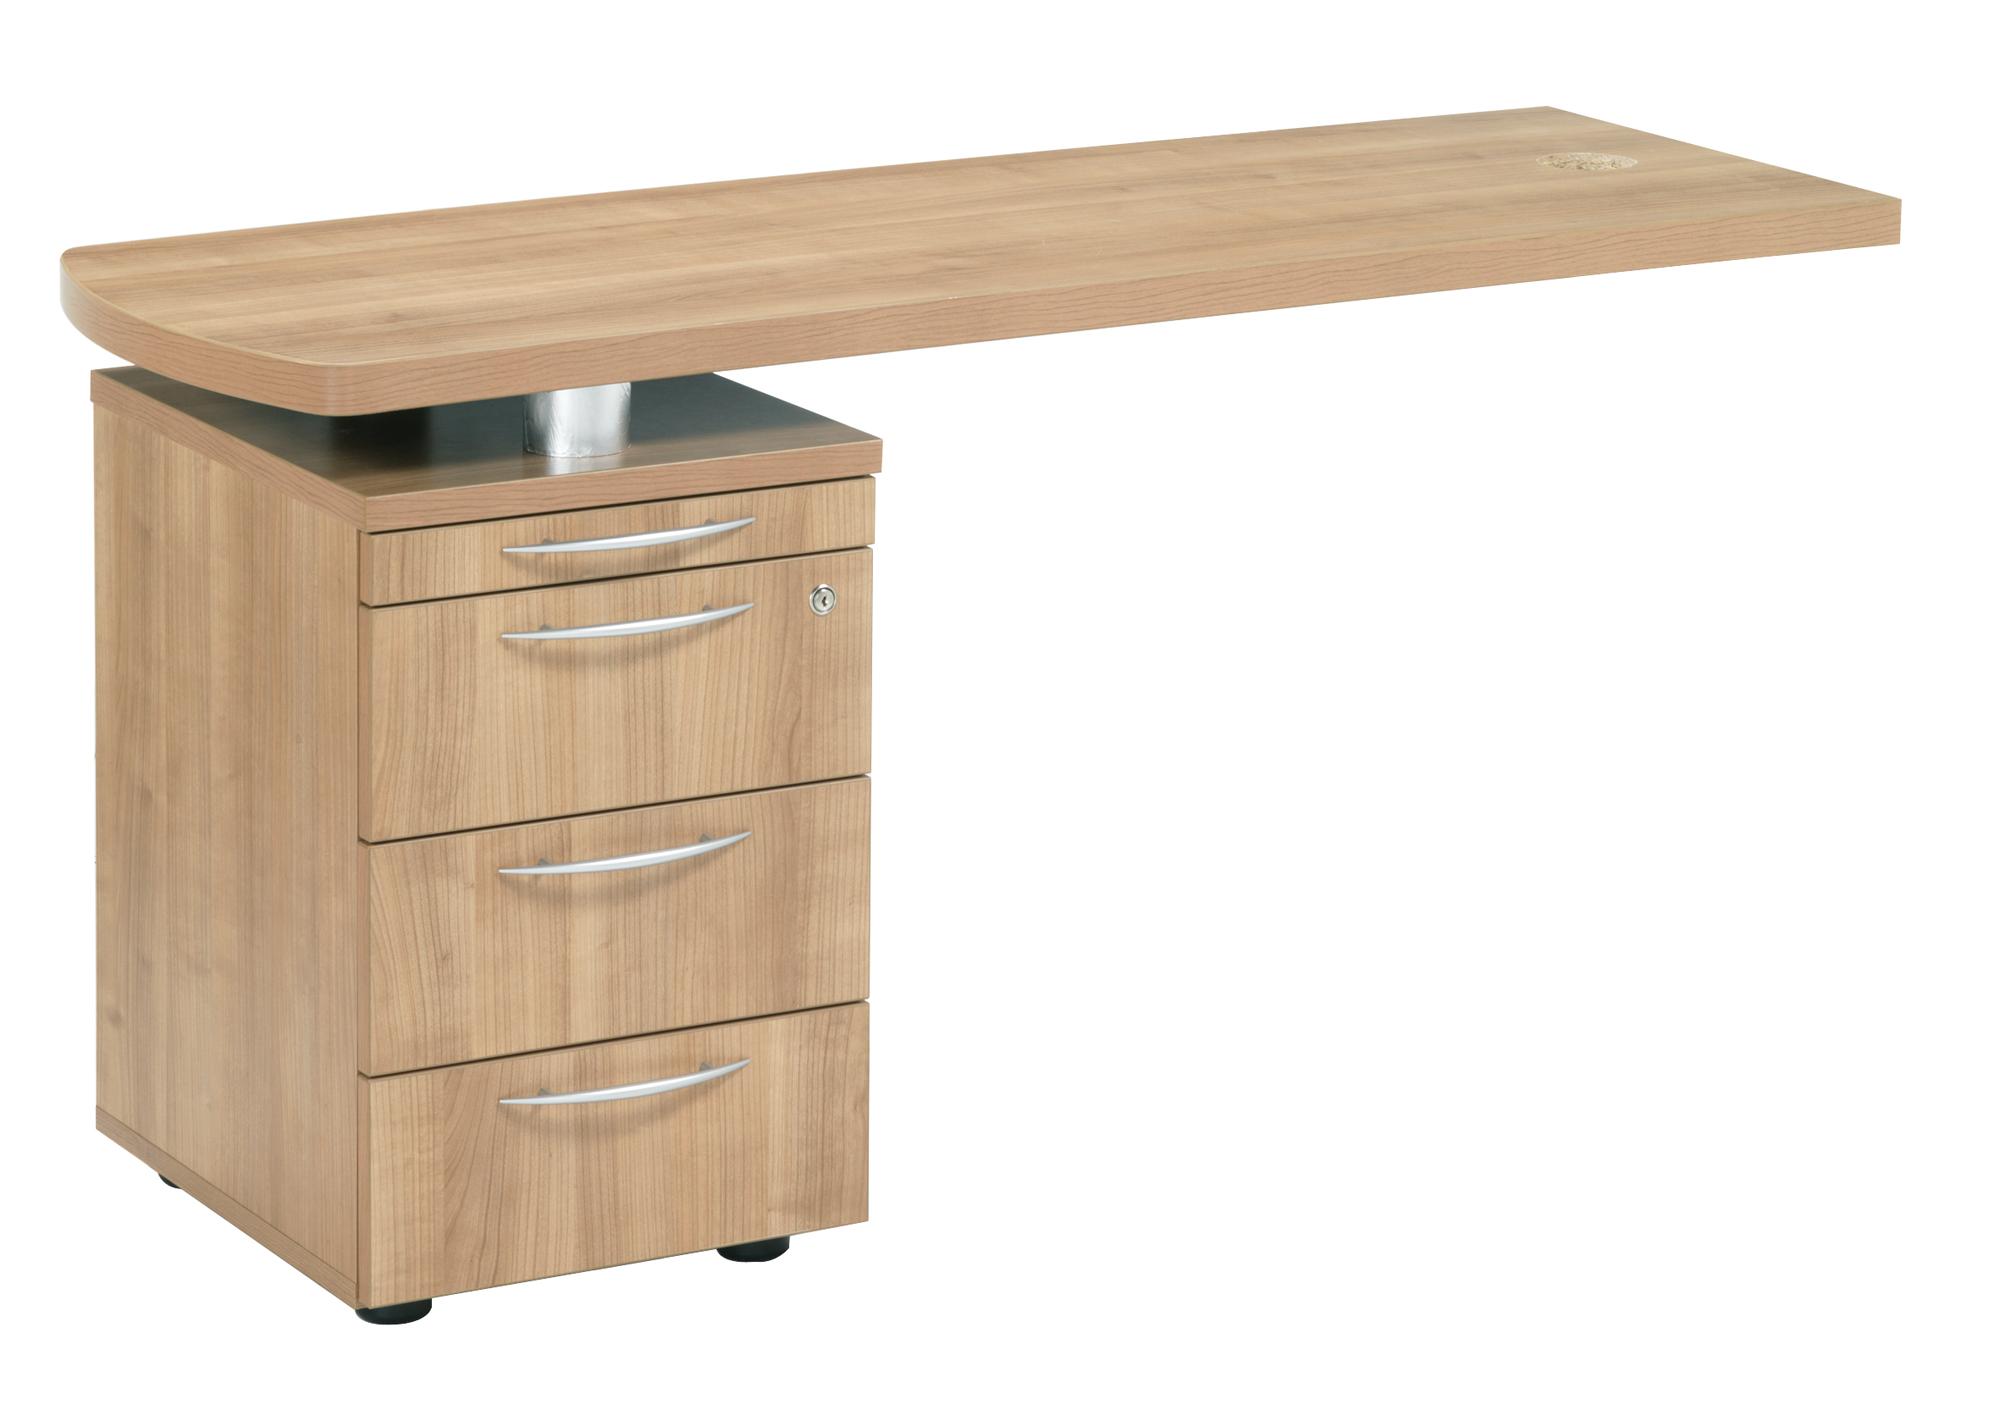 Executive Desk Side Return 3 Drawer 1380x480x700mm Ref